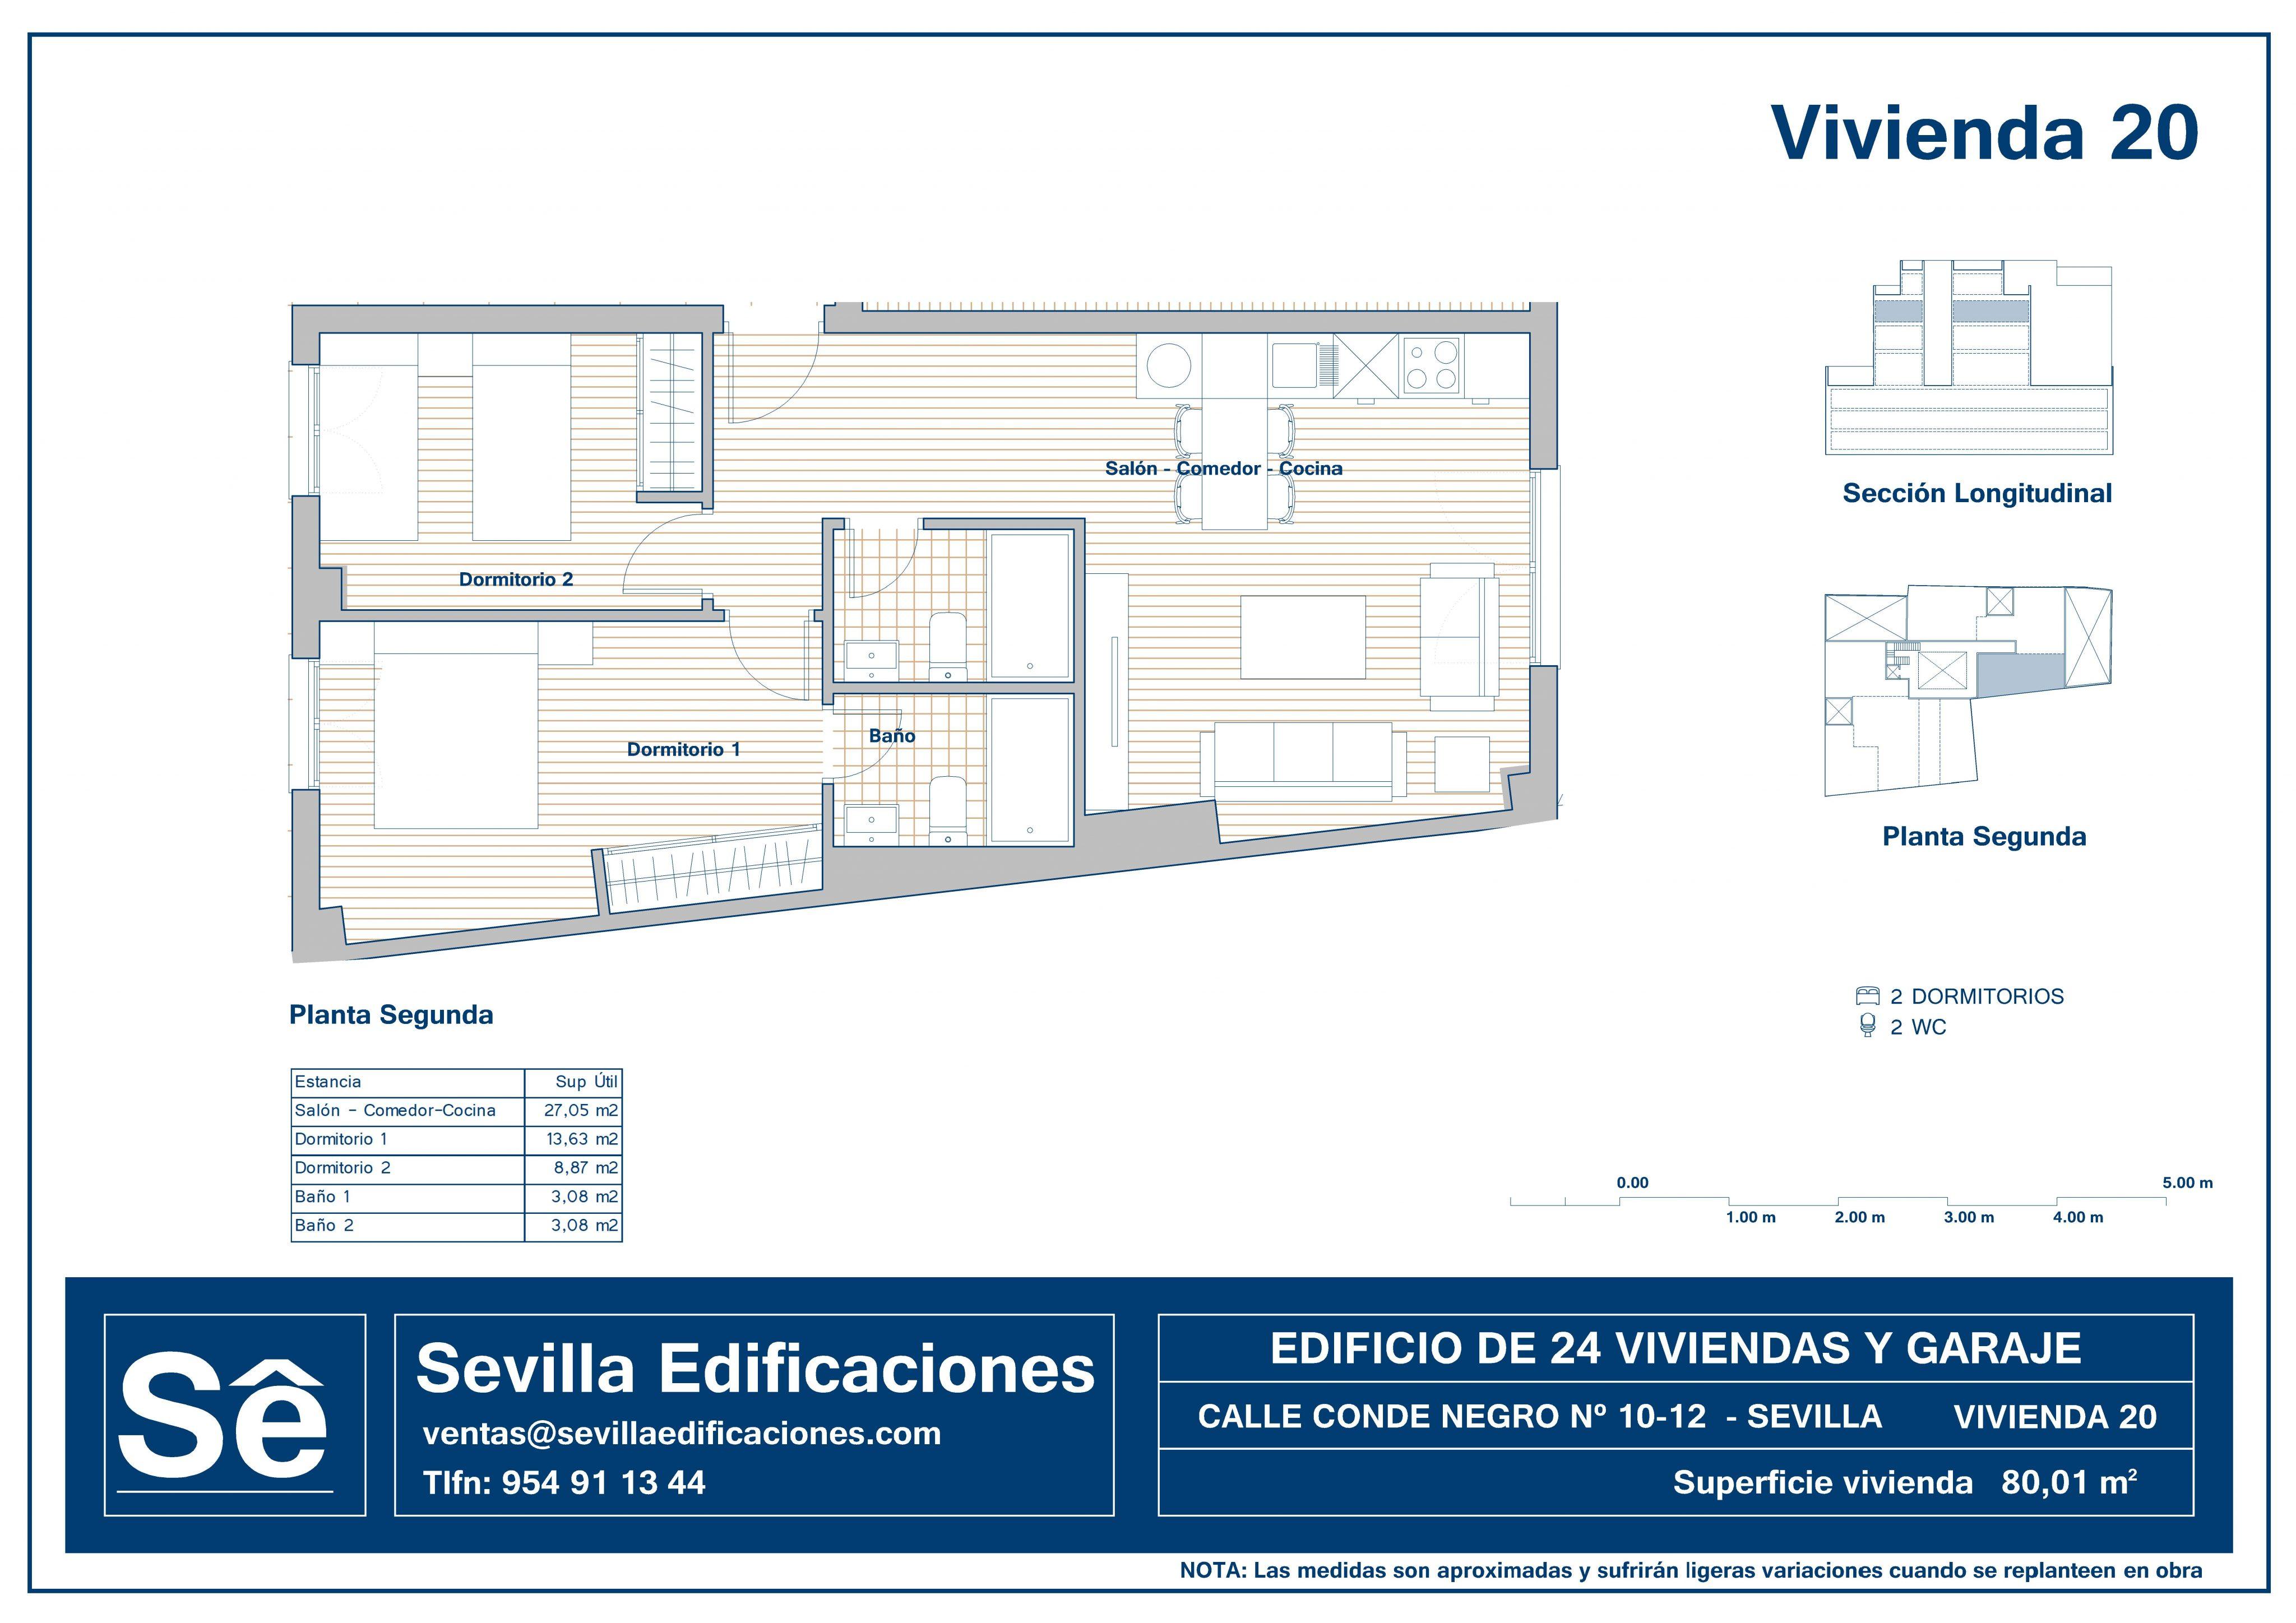 CONDENEGRO_VIVIENDA_20